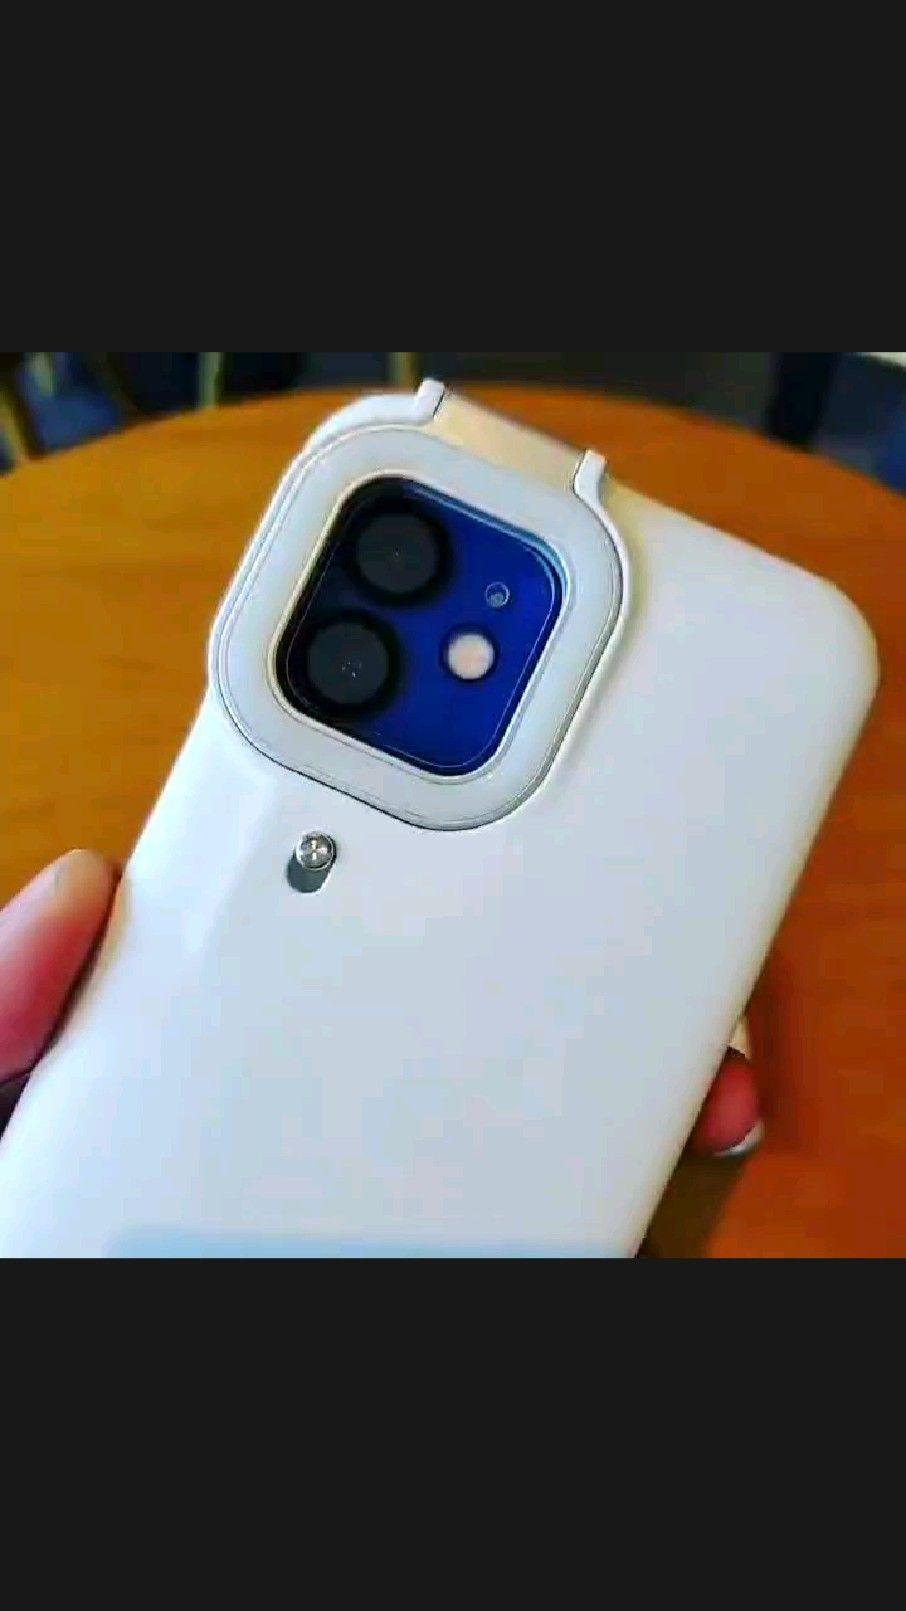 Ring Light iPhone Case